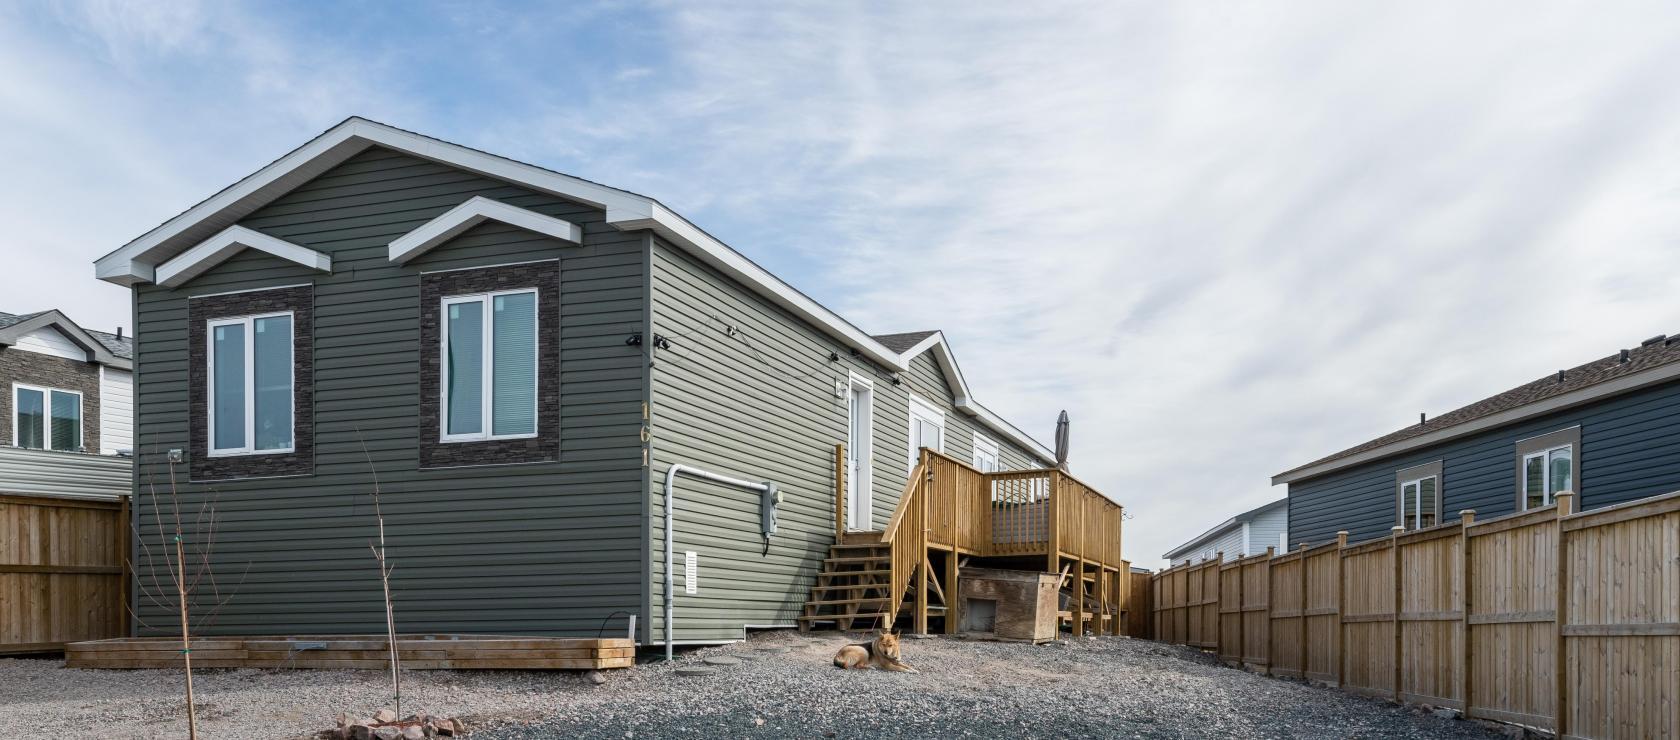 161 Hall Crescent, Kam Lake, Yellowknife 2